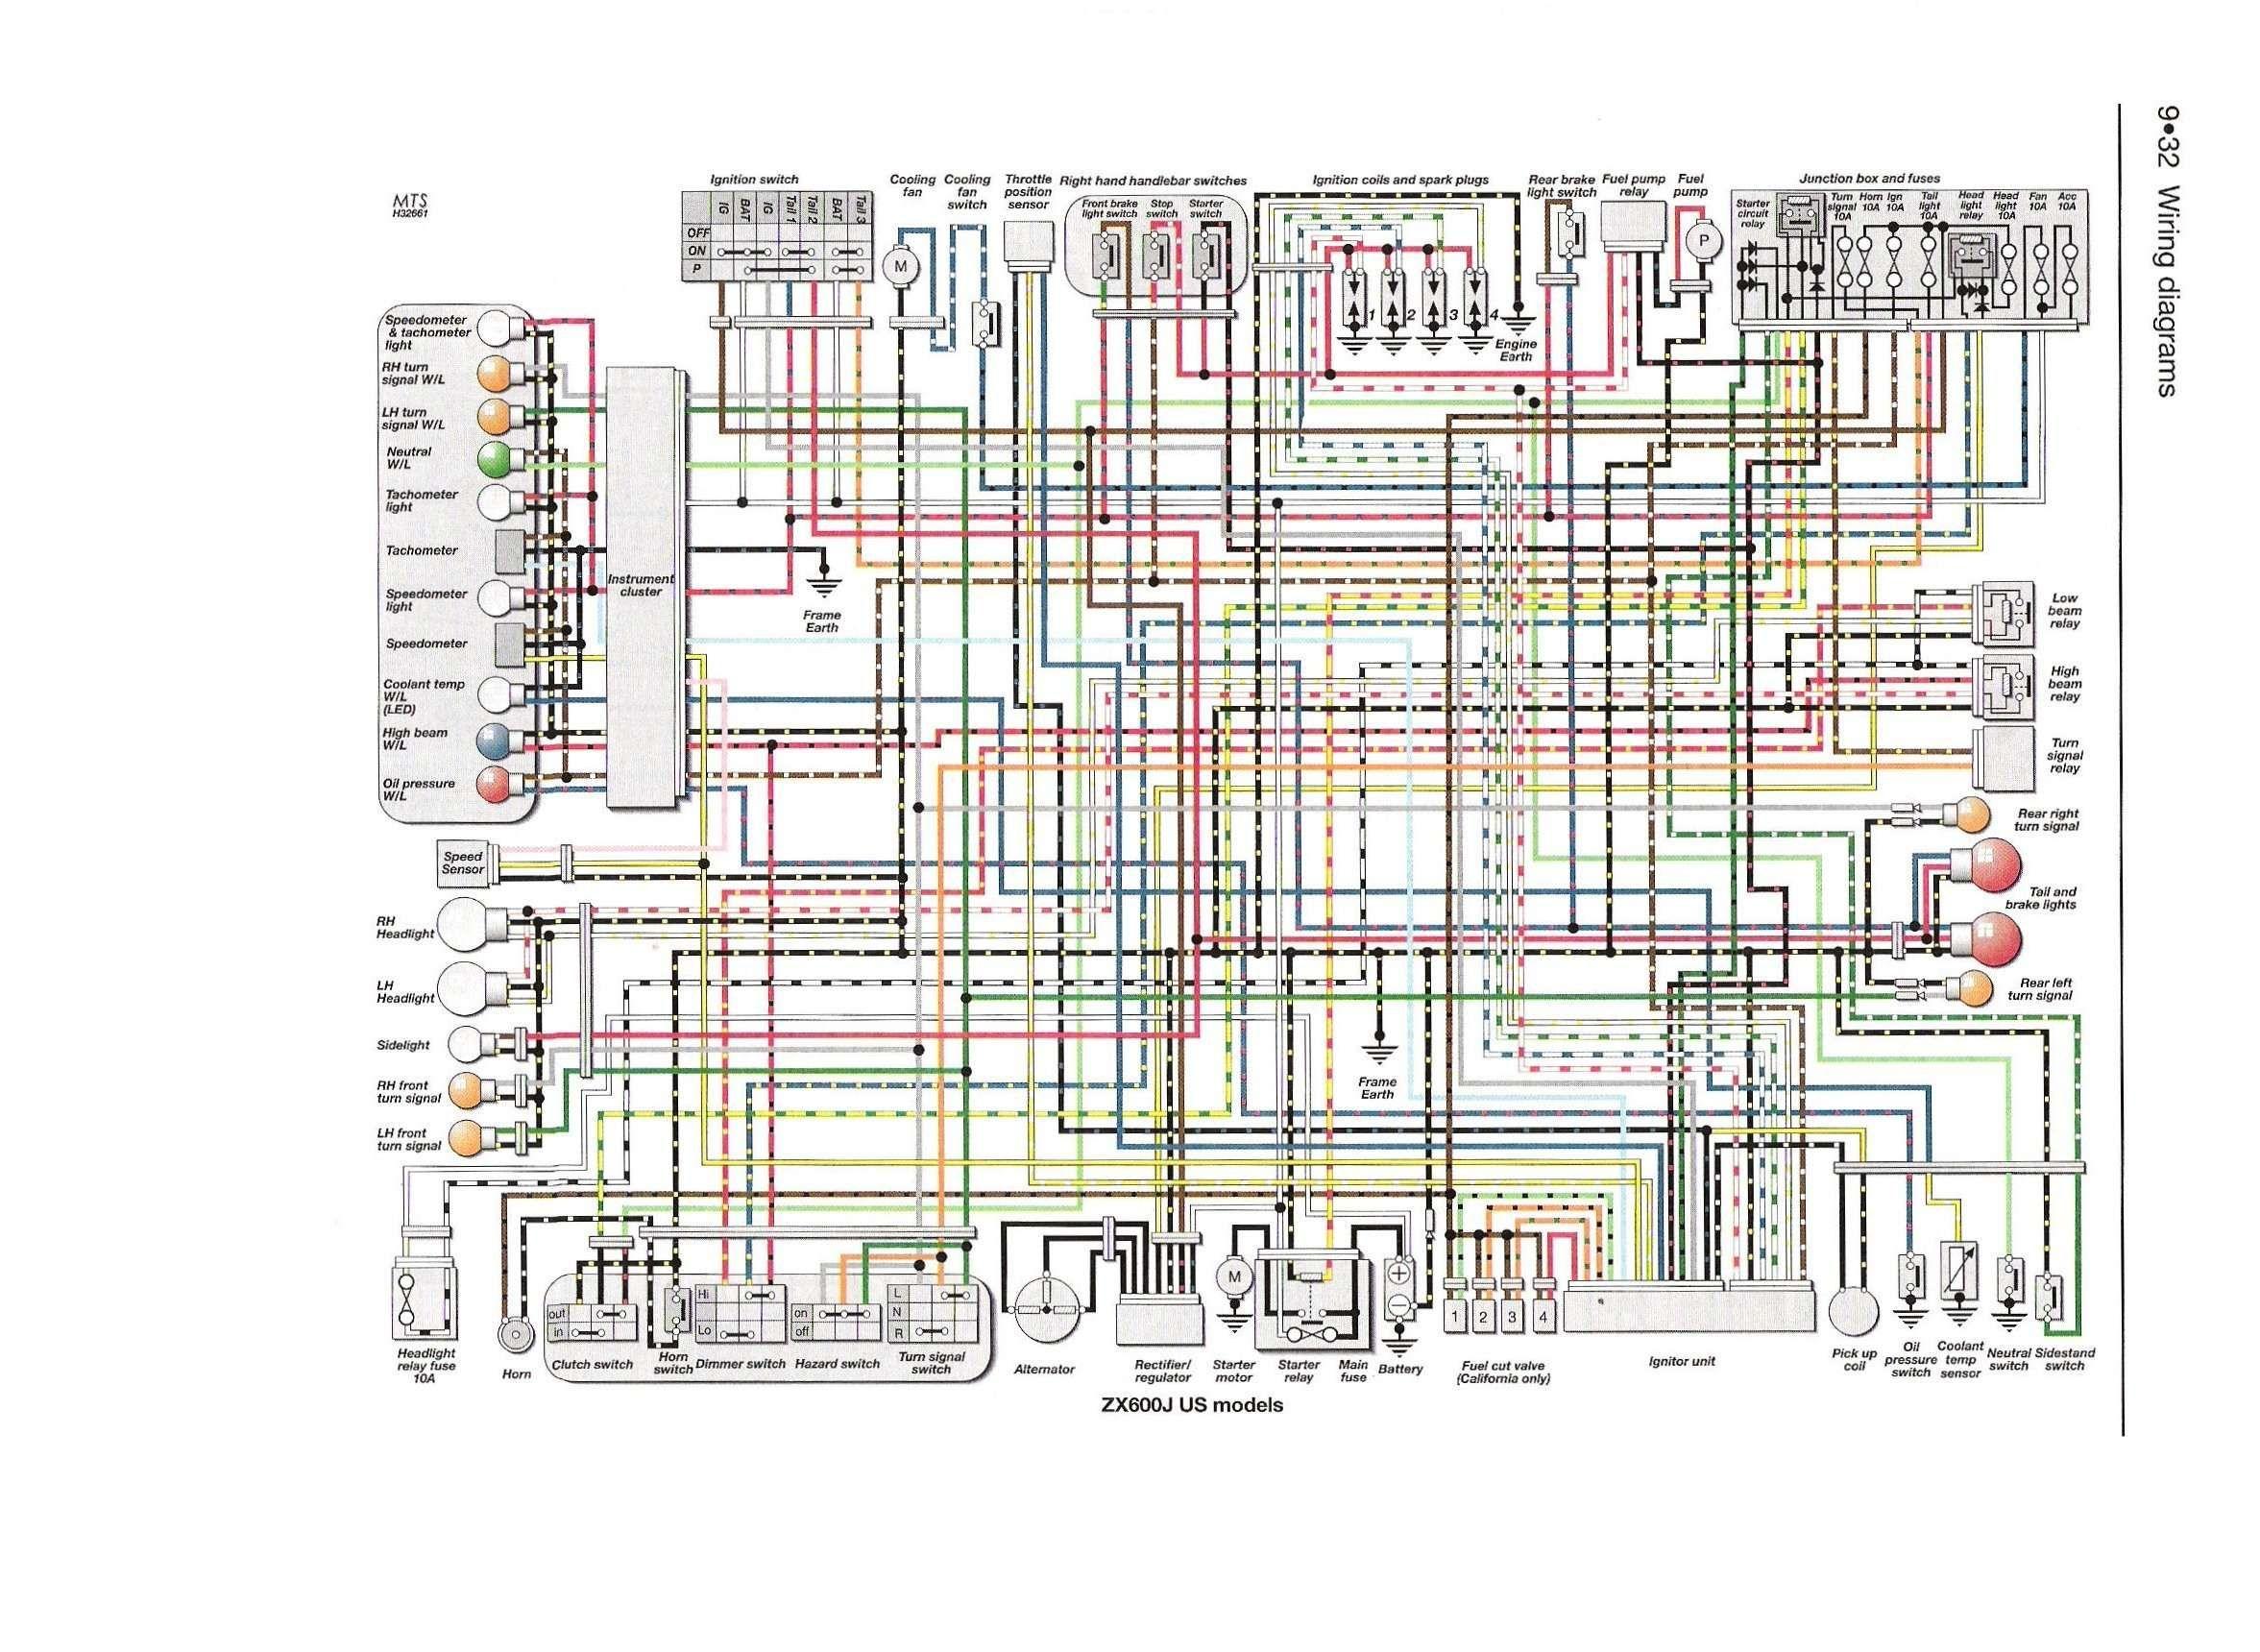 96 Zx7r Wiring Diagram - Wiring Diagram Features Kawasaki Zx R Wiring Diagram on